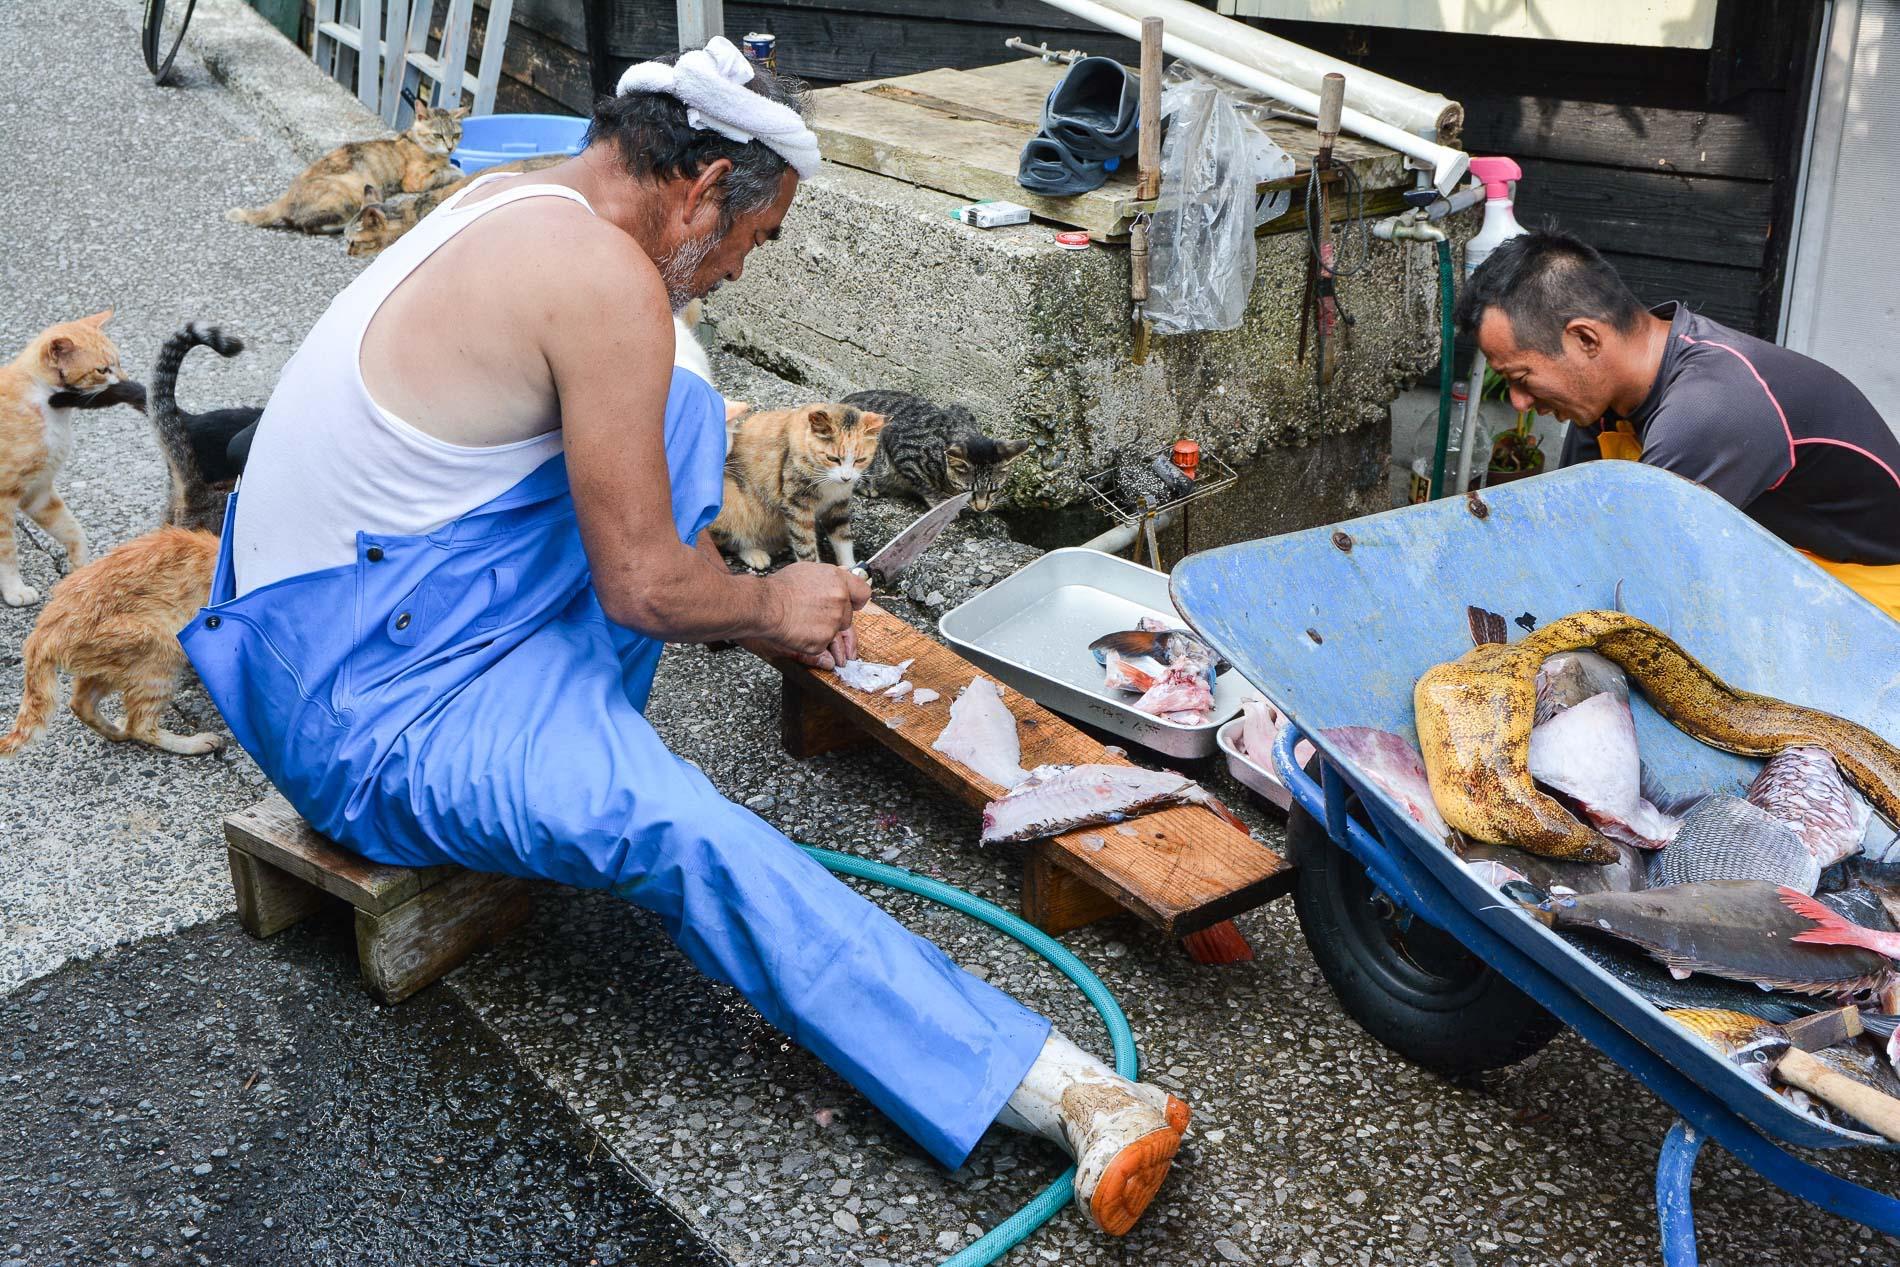 Fukashima fishermen